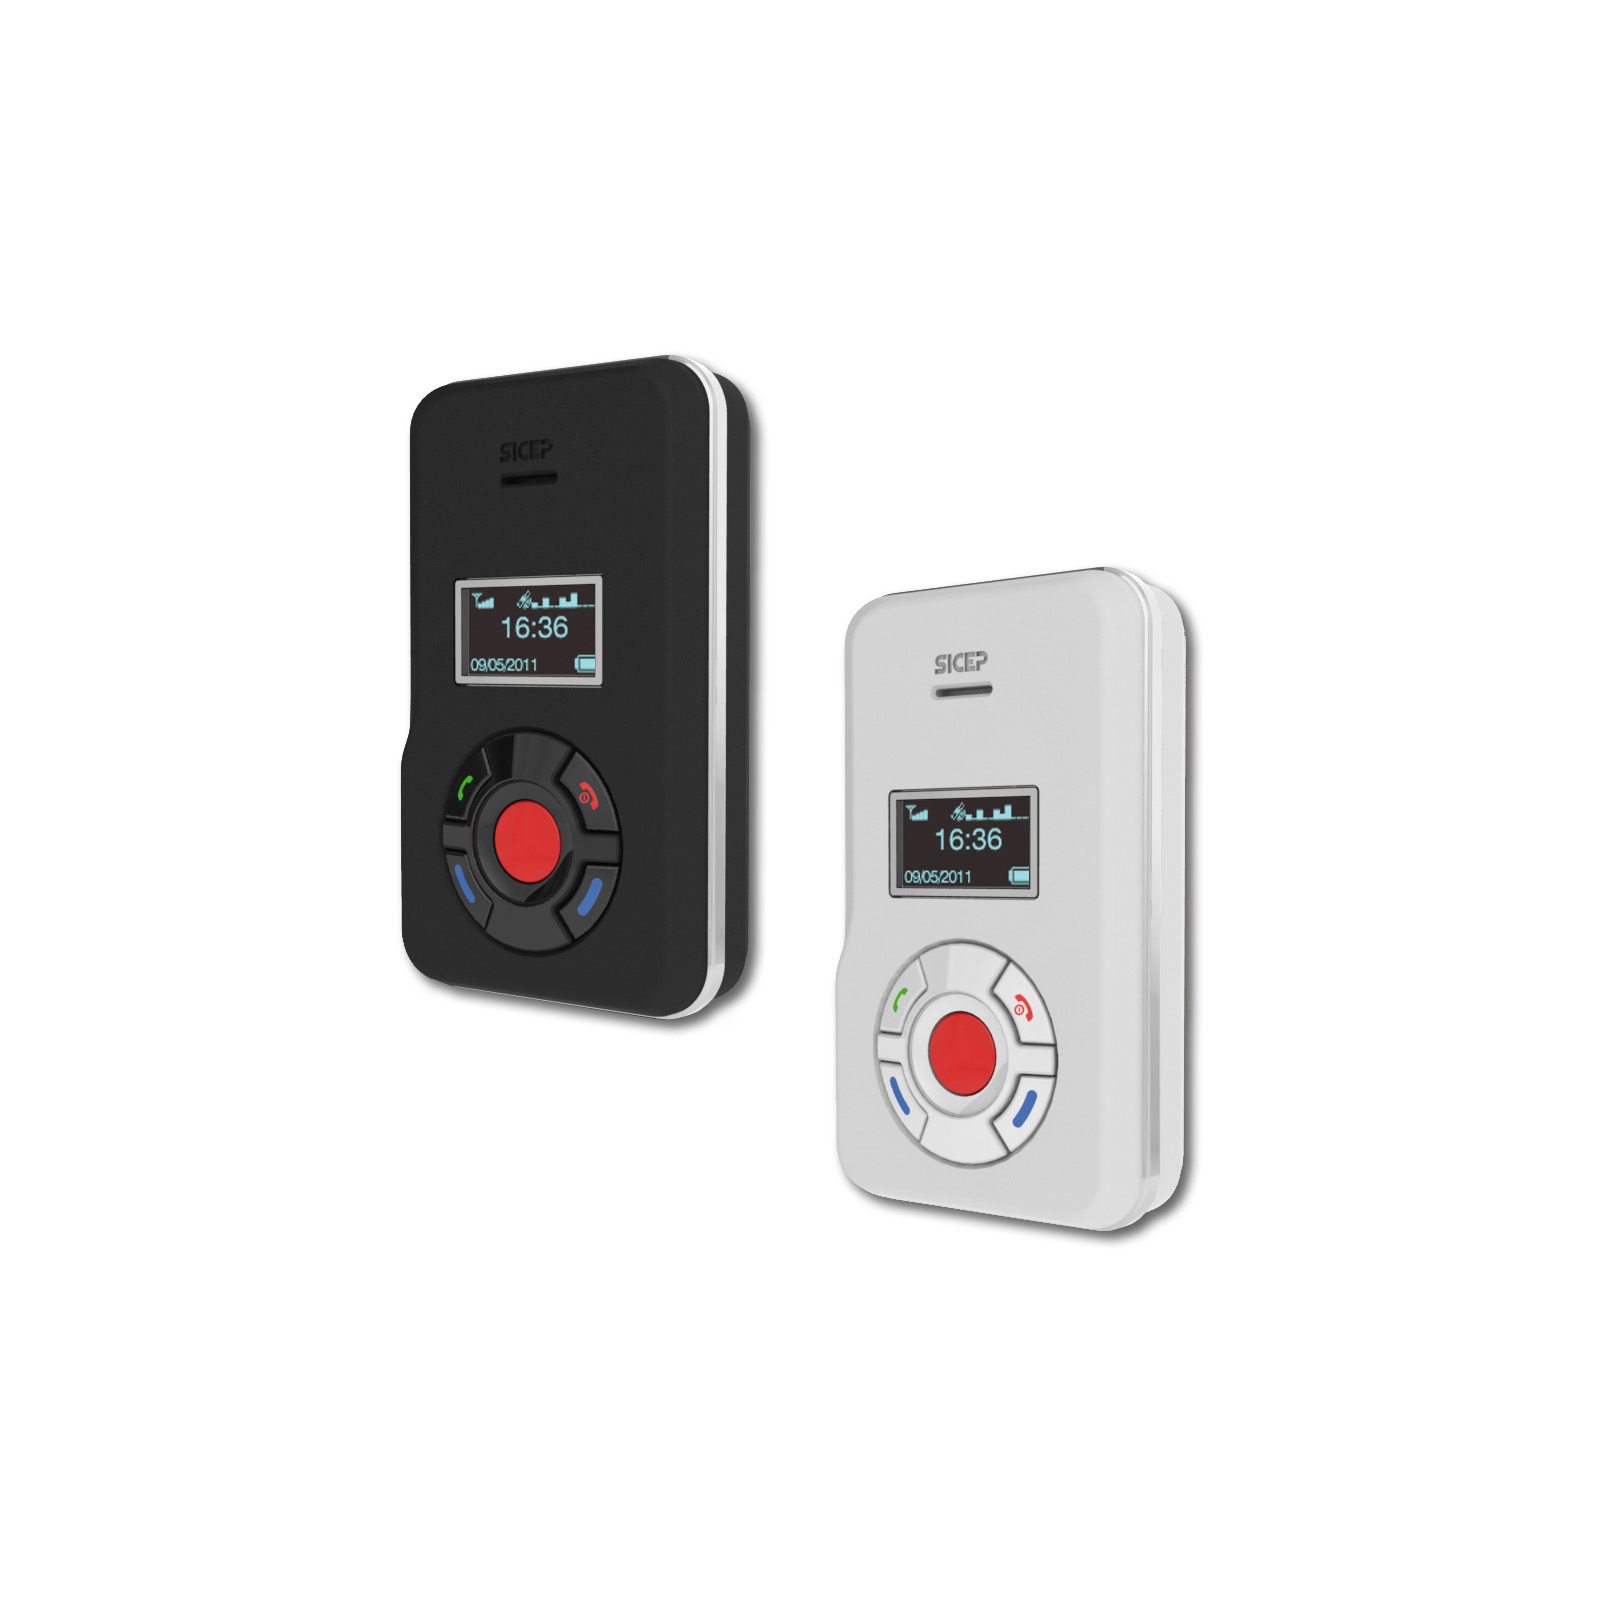 dispositivo-gps-tascabile-gsm-gprs-4-tasti-chiamata-rapida